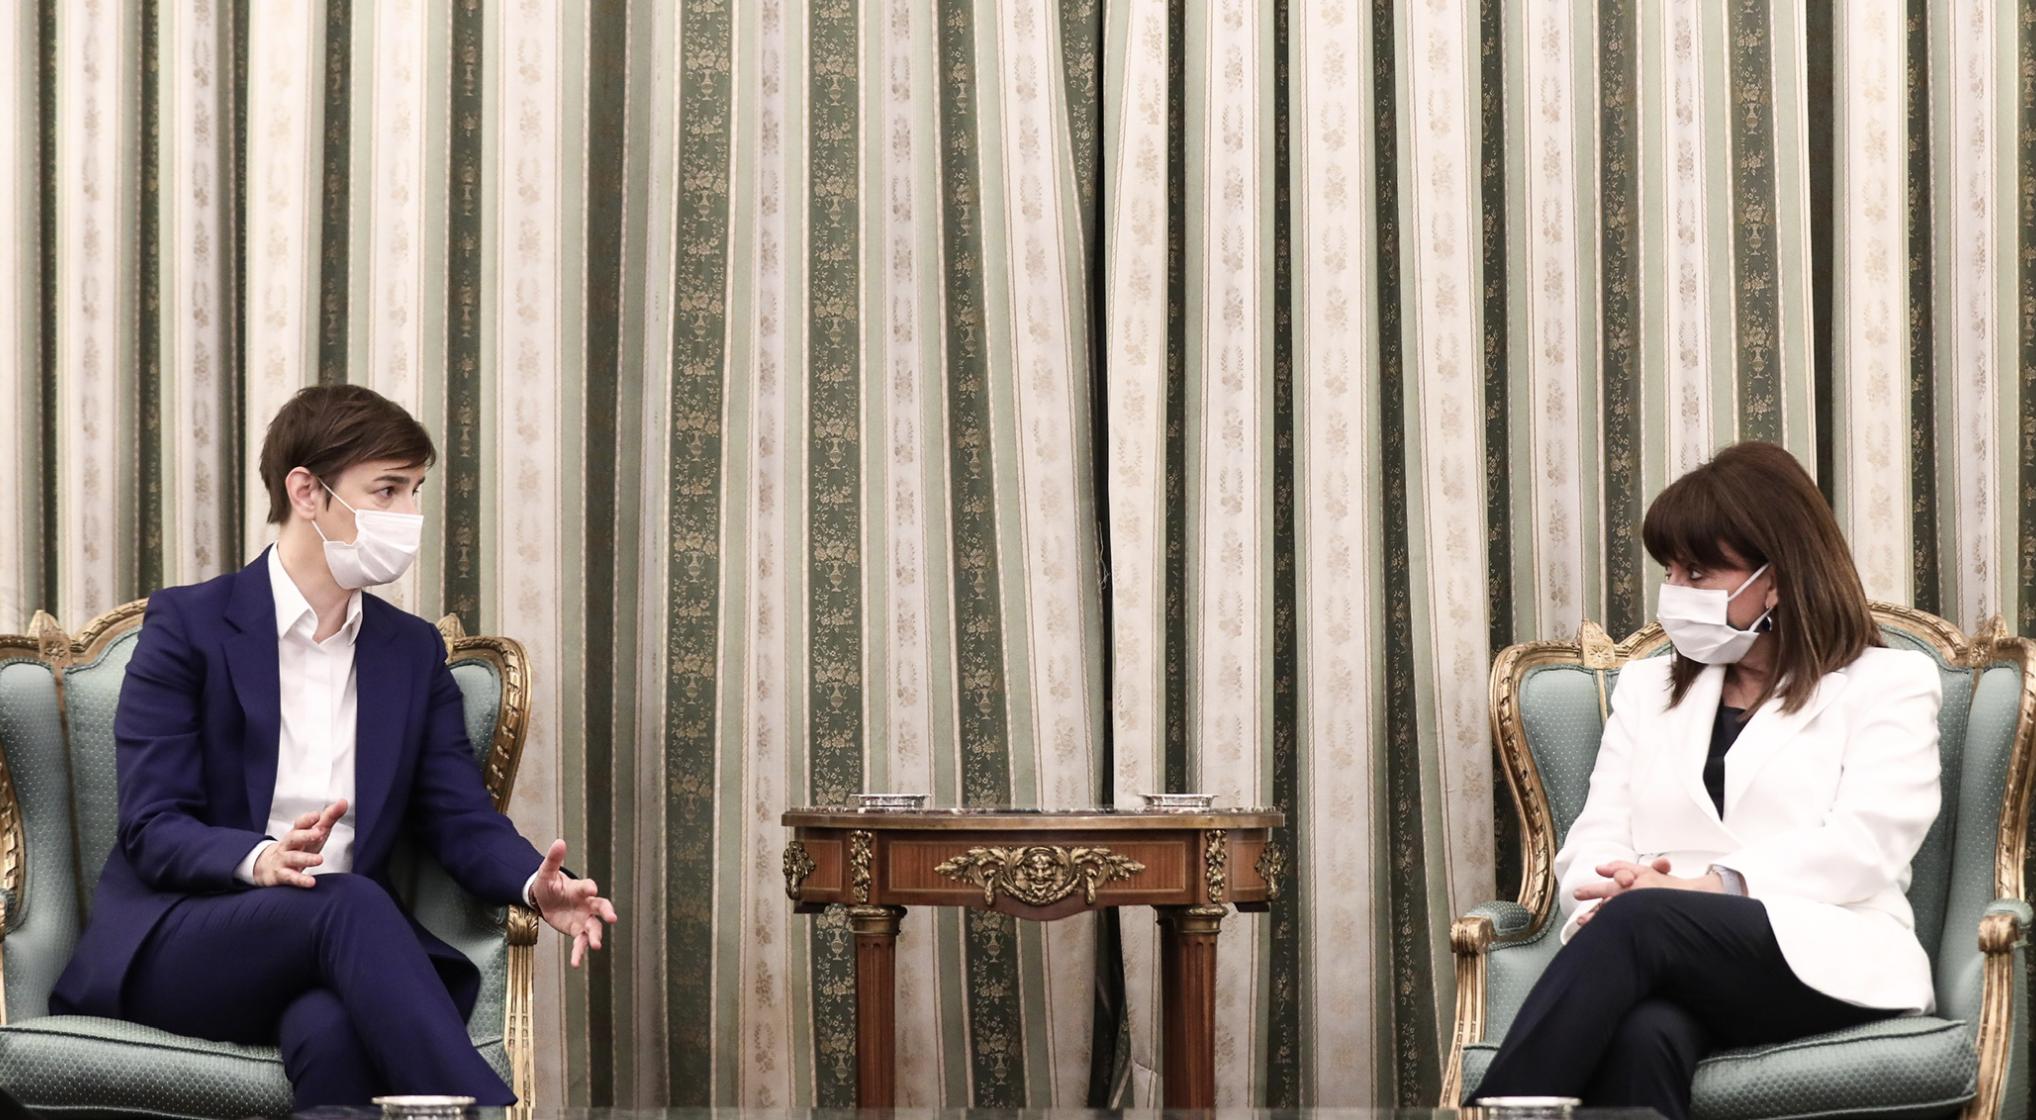 Greece: The President of the Republic met with Krivokapić, Brnabić and Dodik